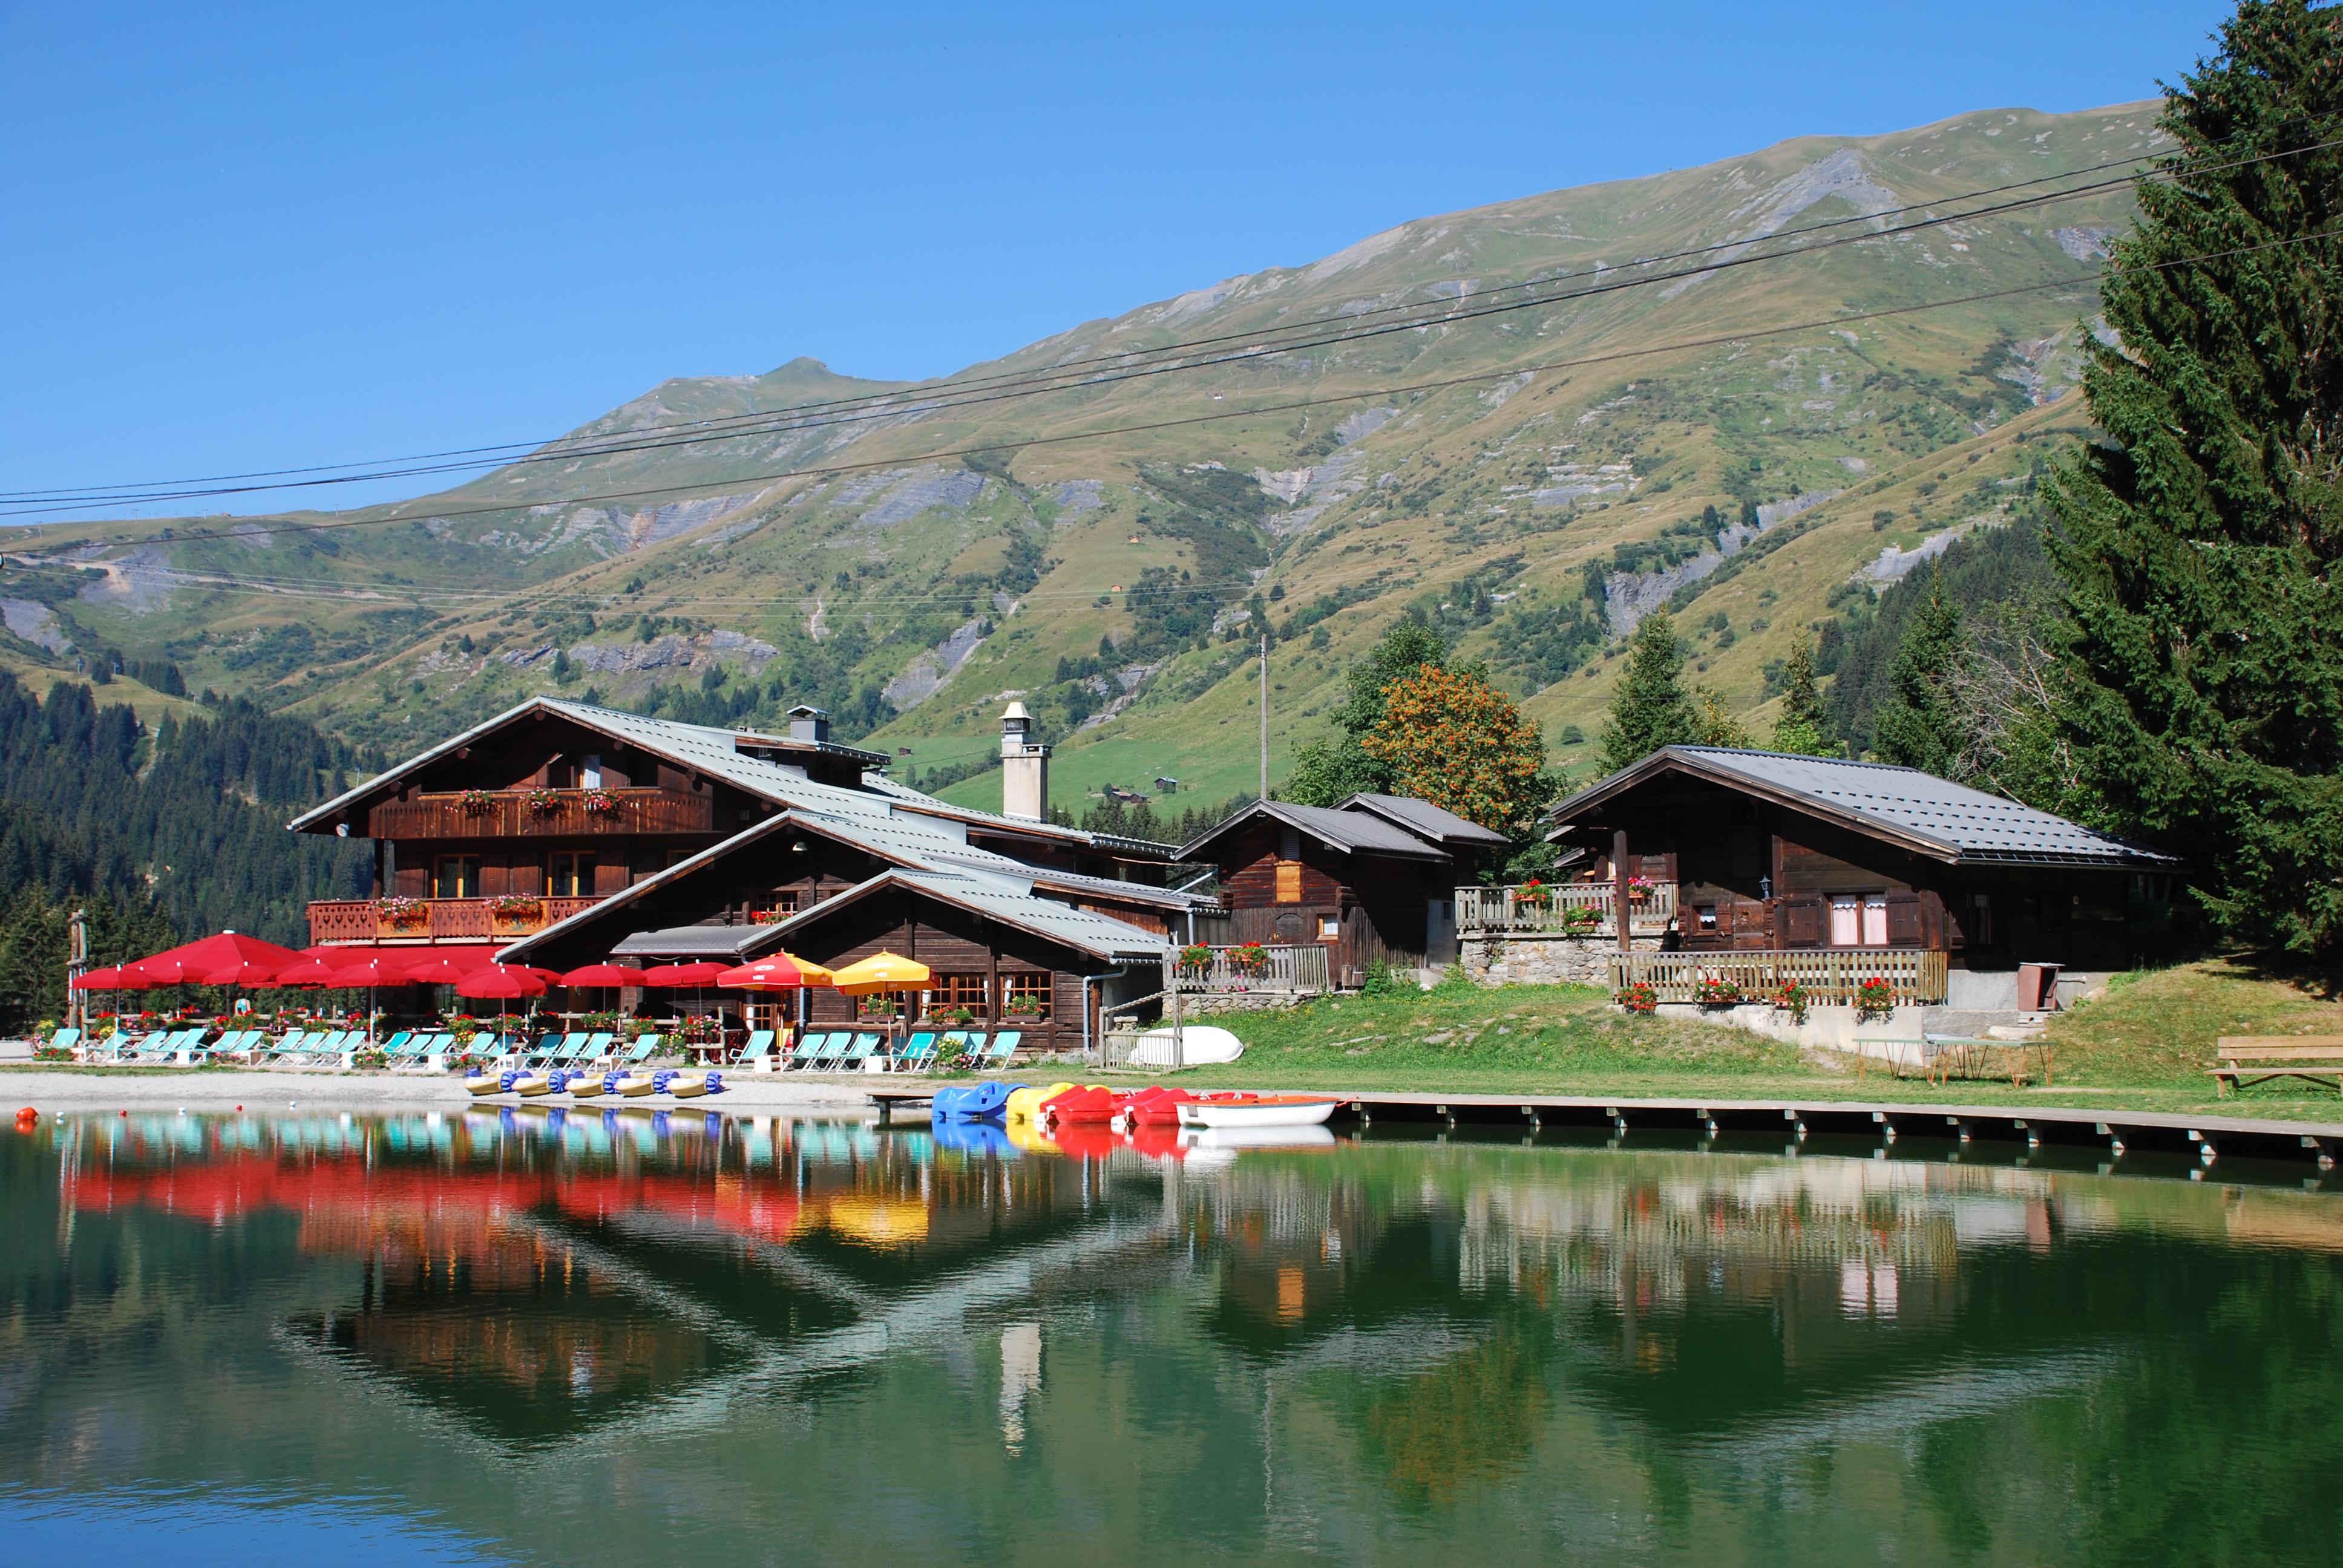 Hotel chalet de l 39 etape les contamines montjoie les contamines montjoie tourisme - Office tourisme les contamines montjoie ...